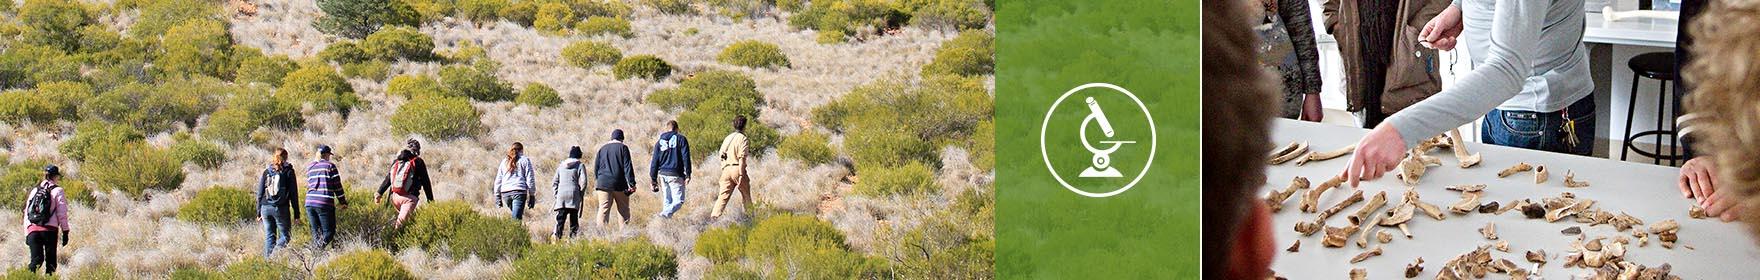 Environmental Science & Outdoor Recreation